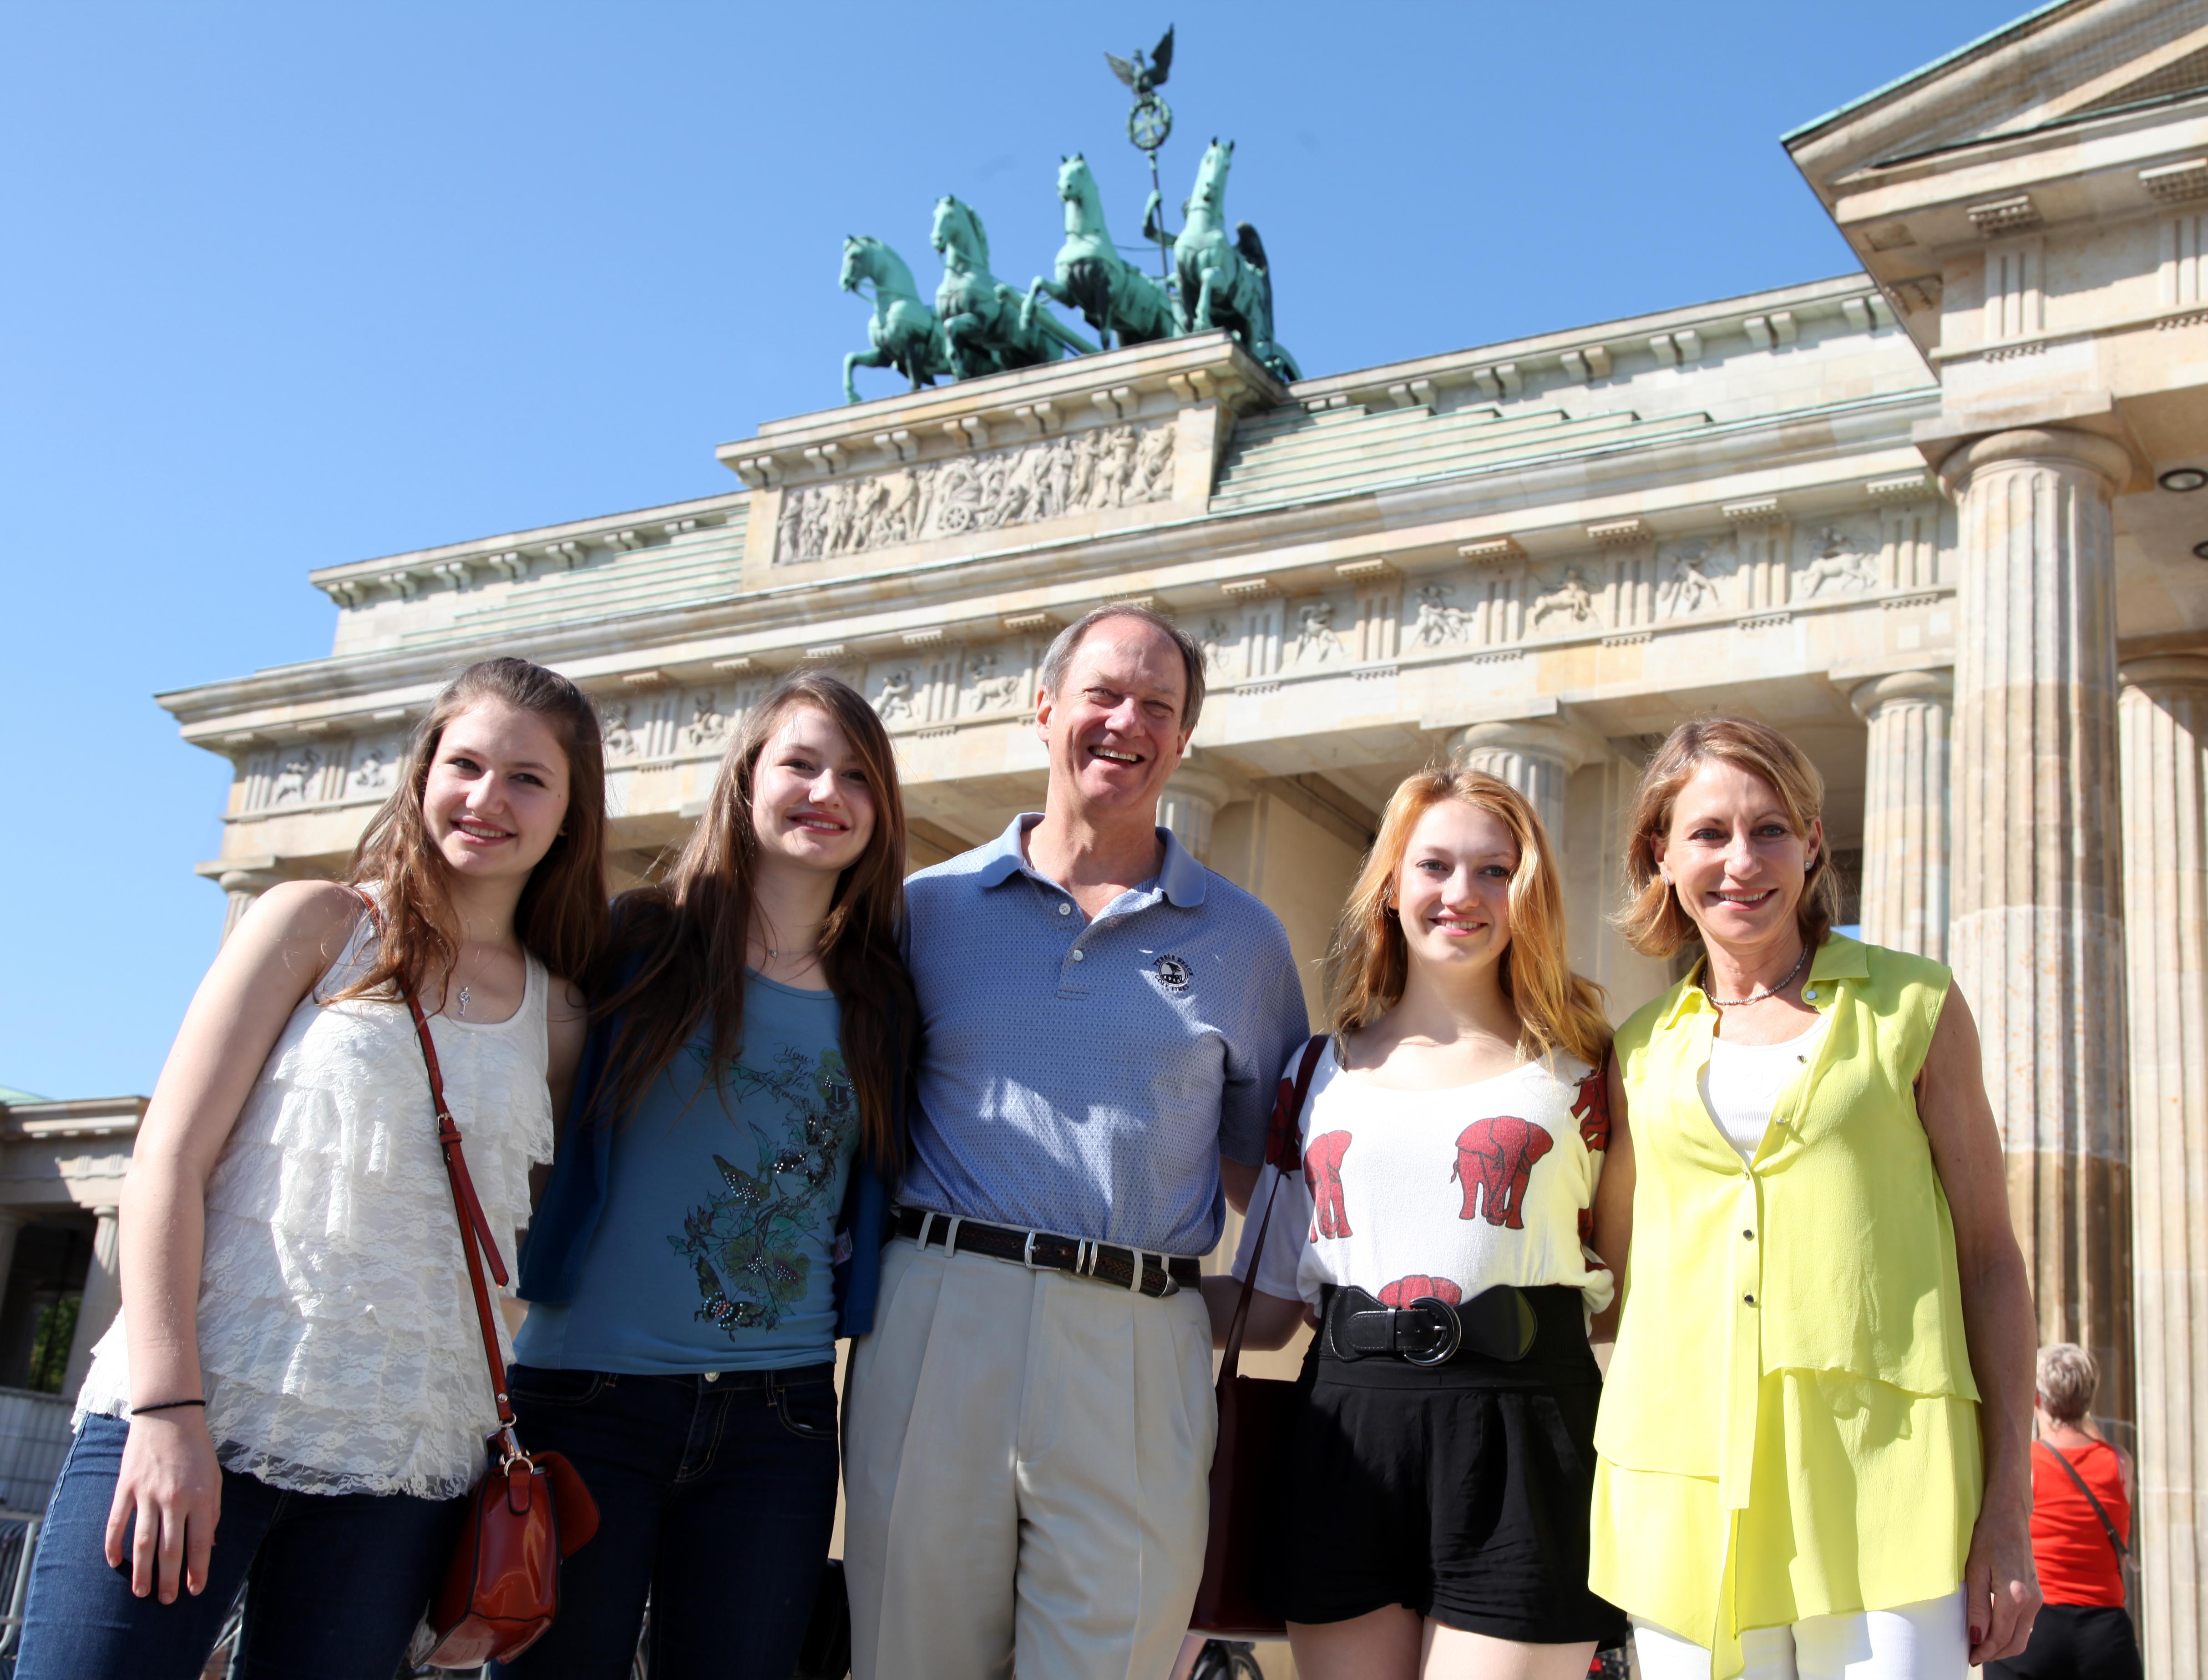 usbotschaftberlin-the-emerson-family-gets-initial-tour-of-berl